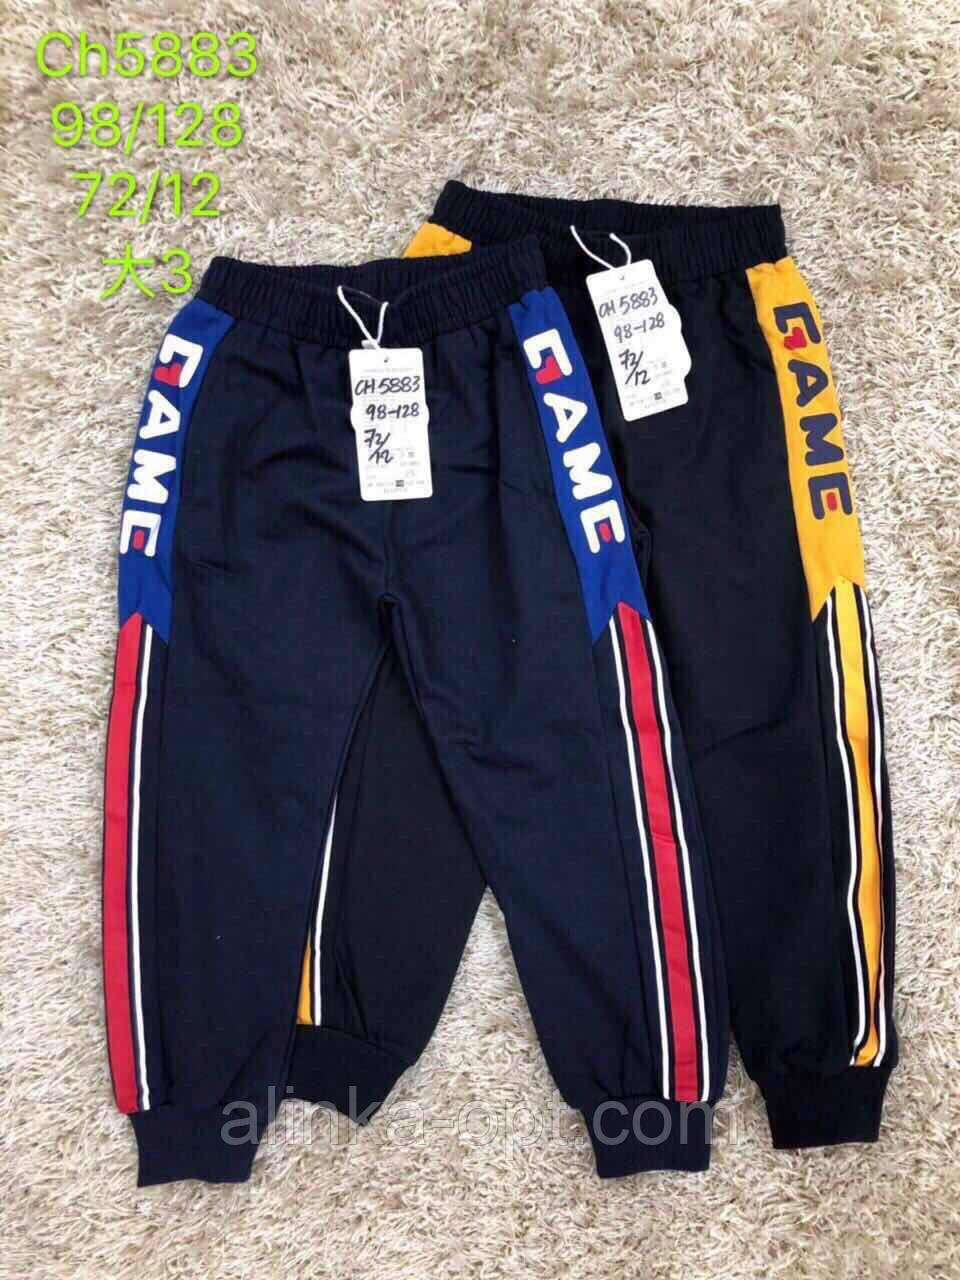 Спортивные брюки для мальчиков S&D, 98-128 рр. Артикул: CH5883